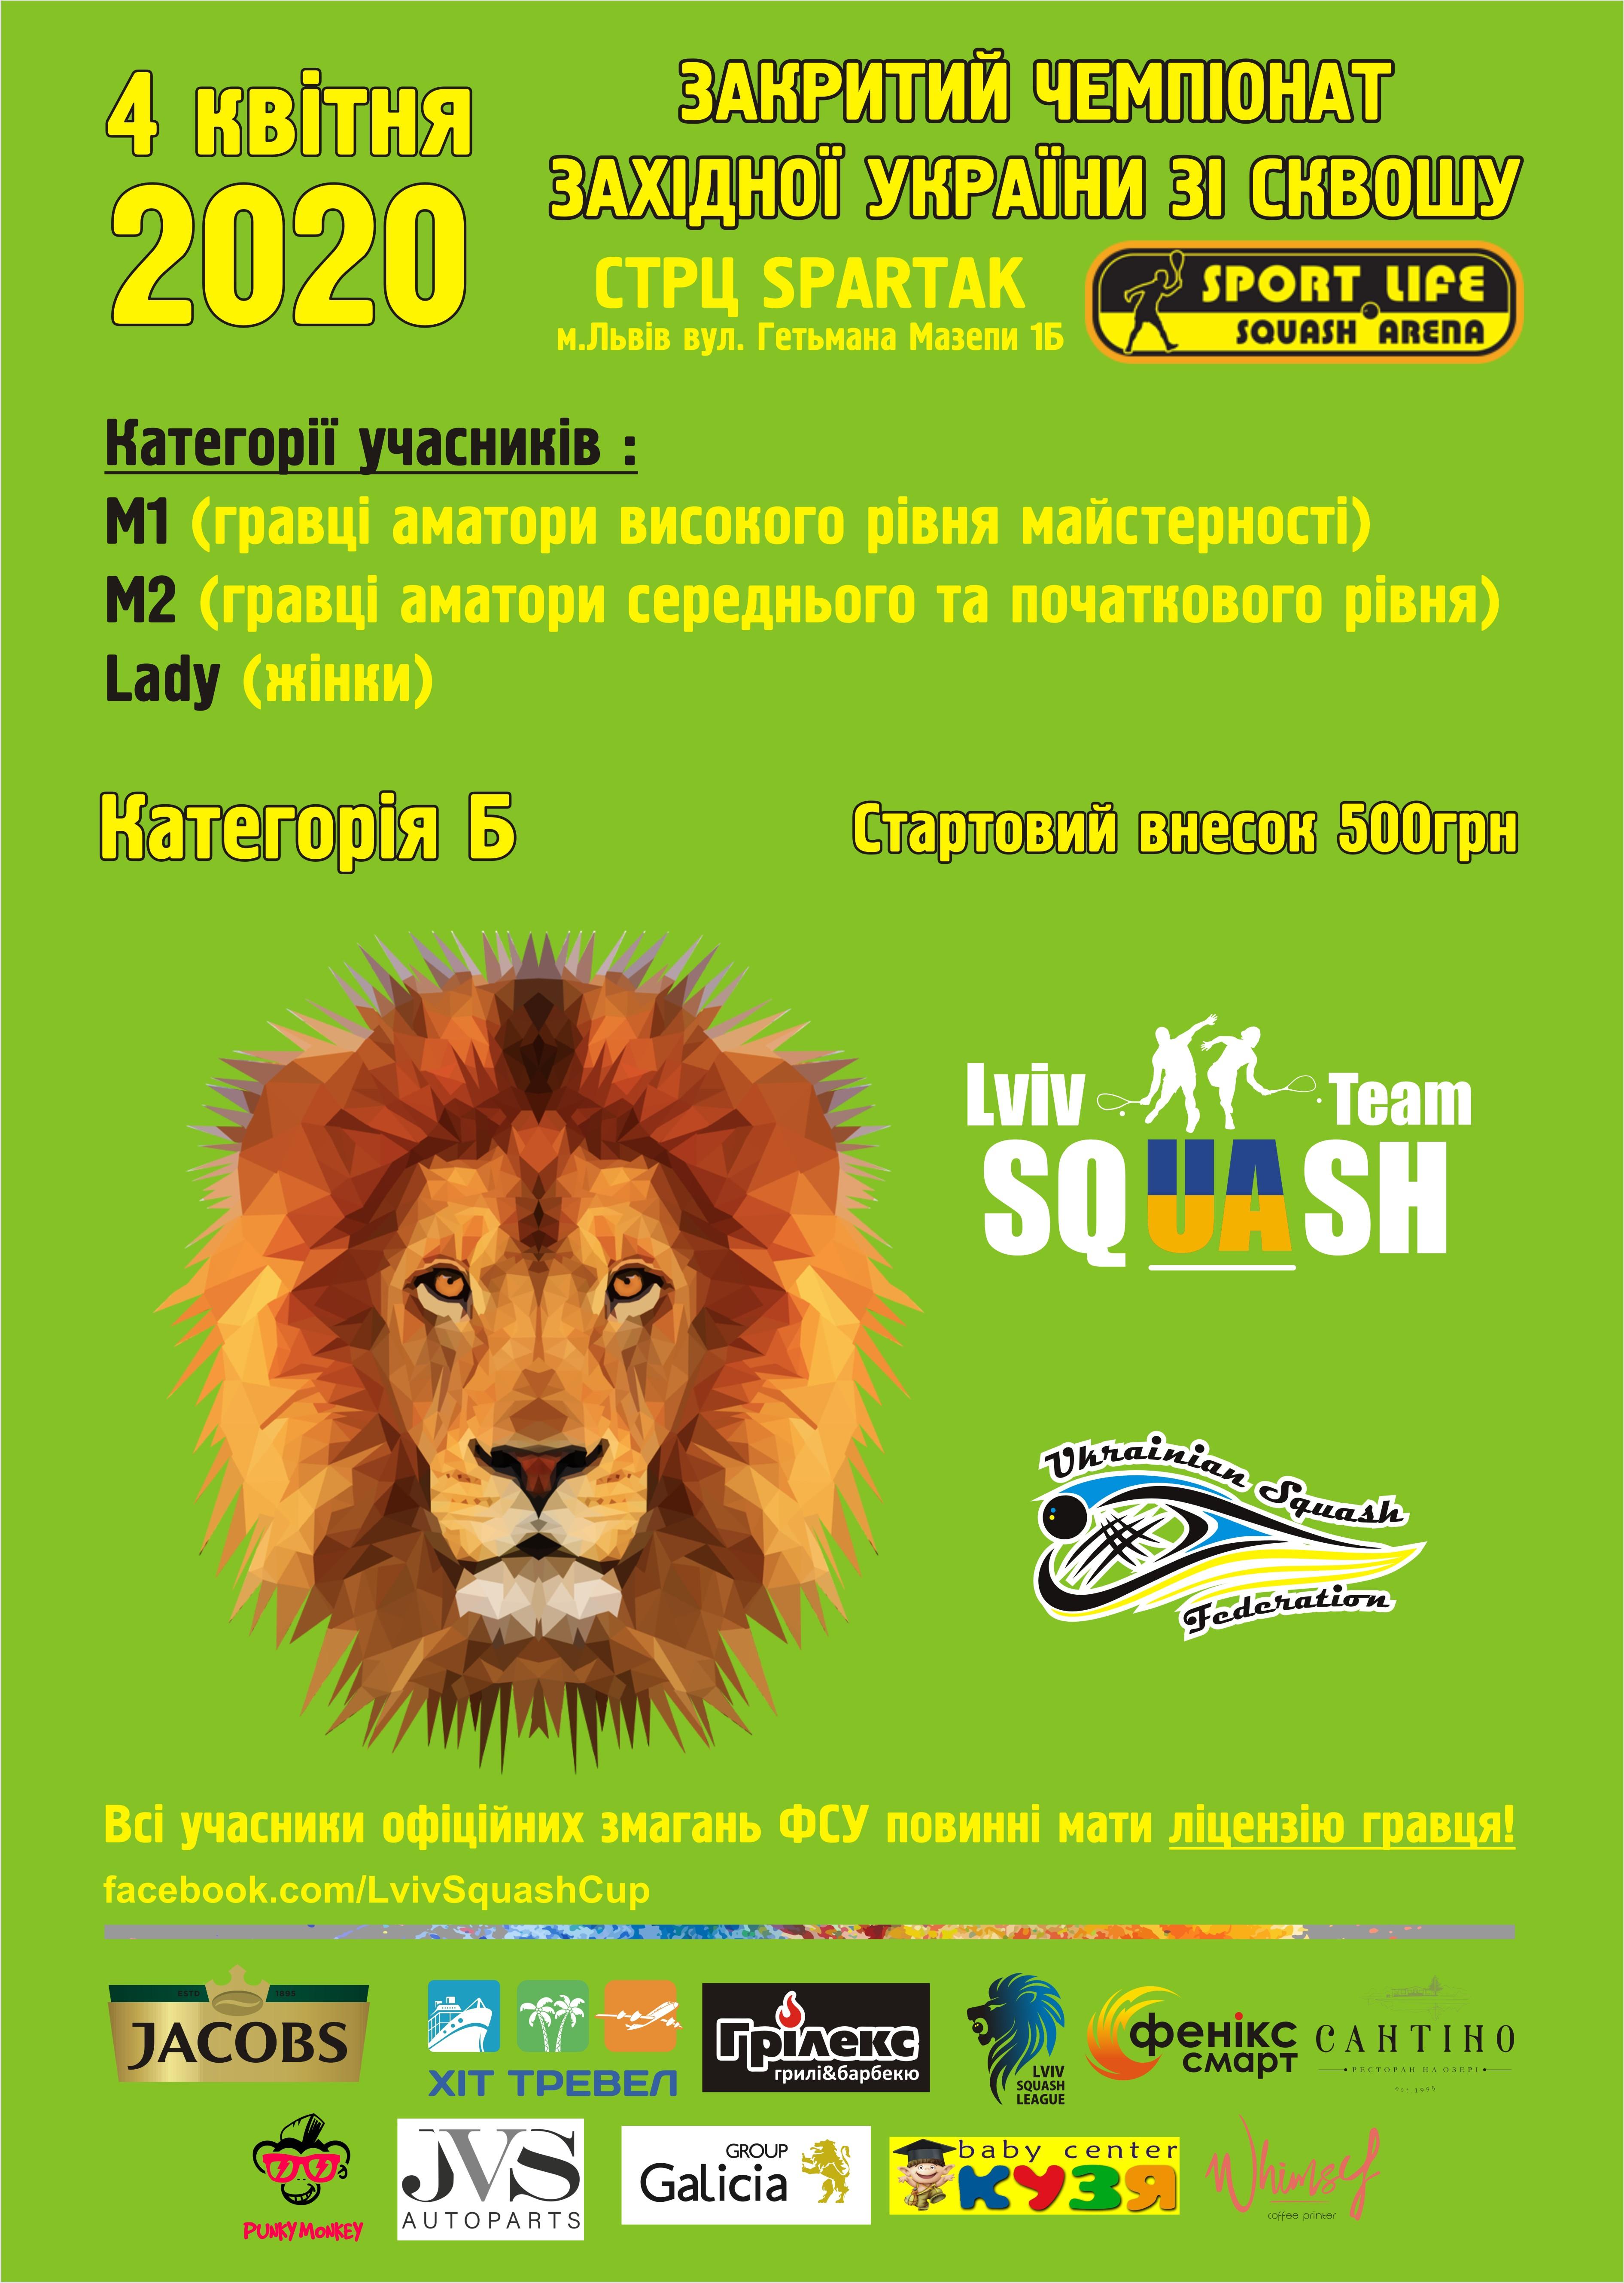 Closed Championship of Western Ukraine in squash